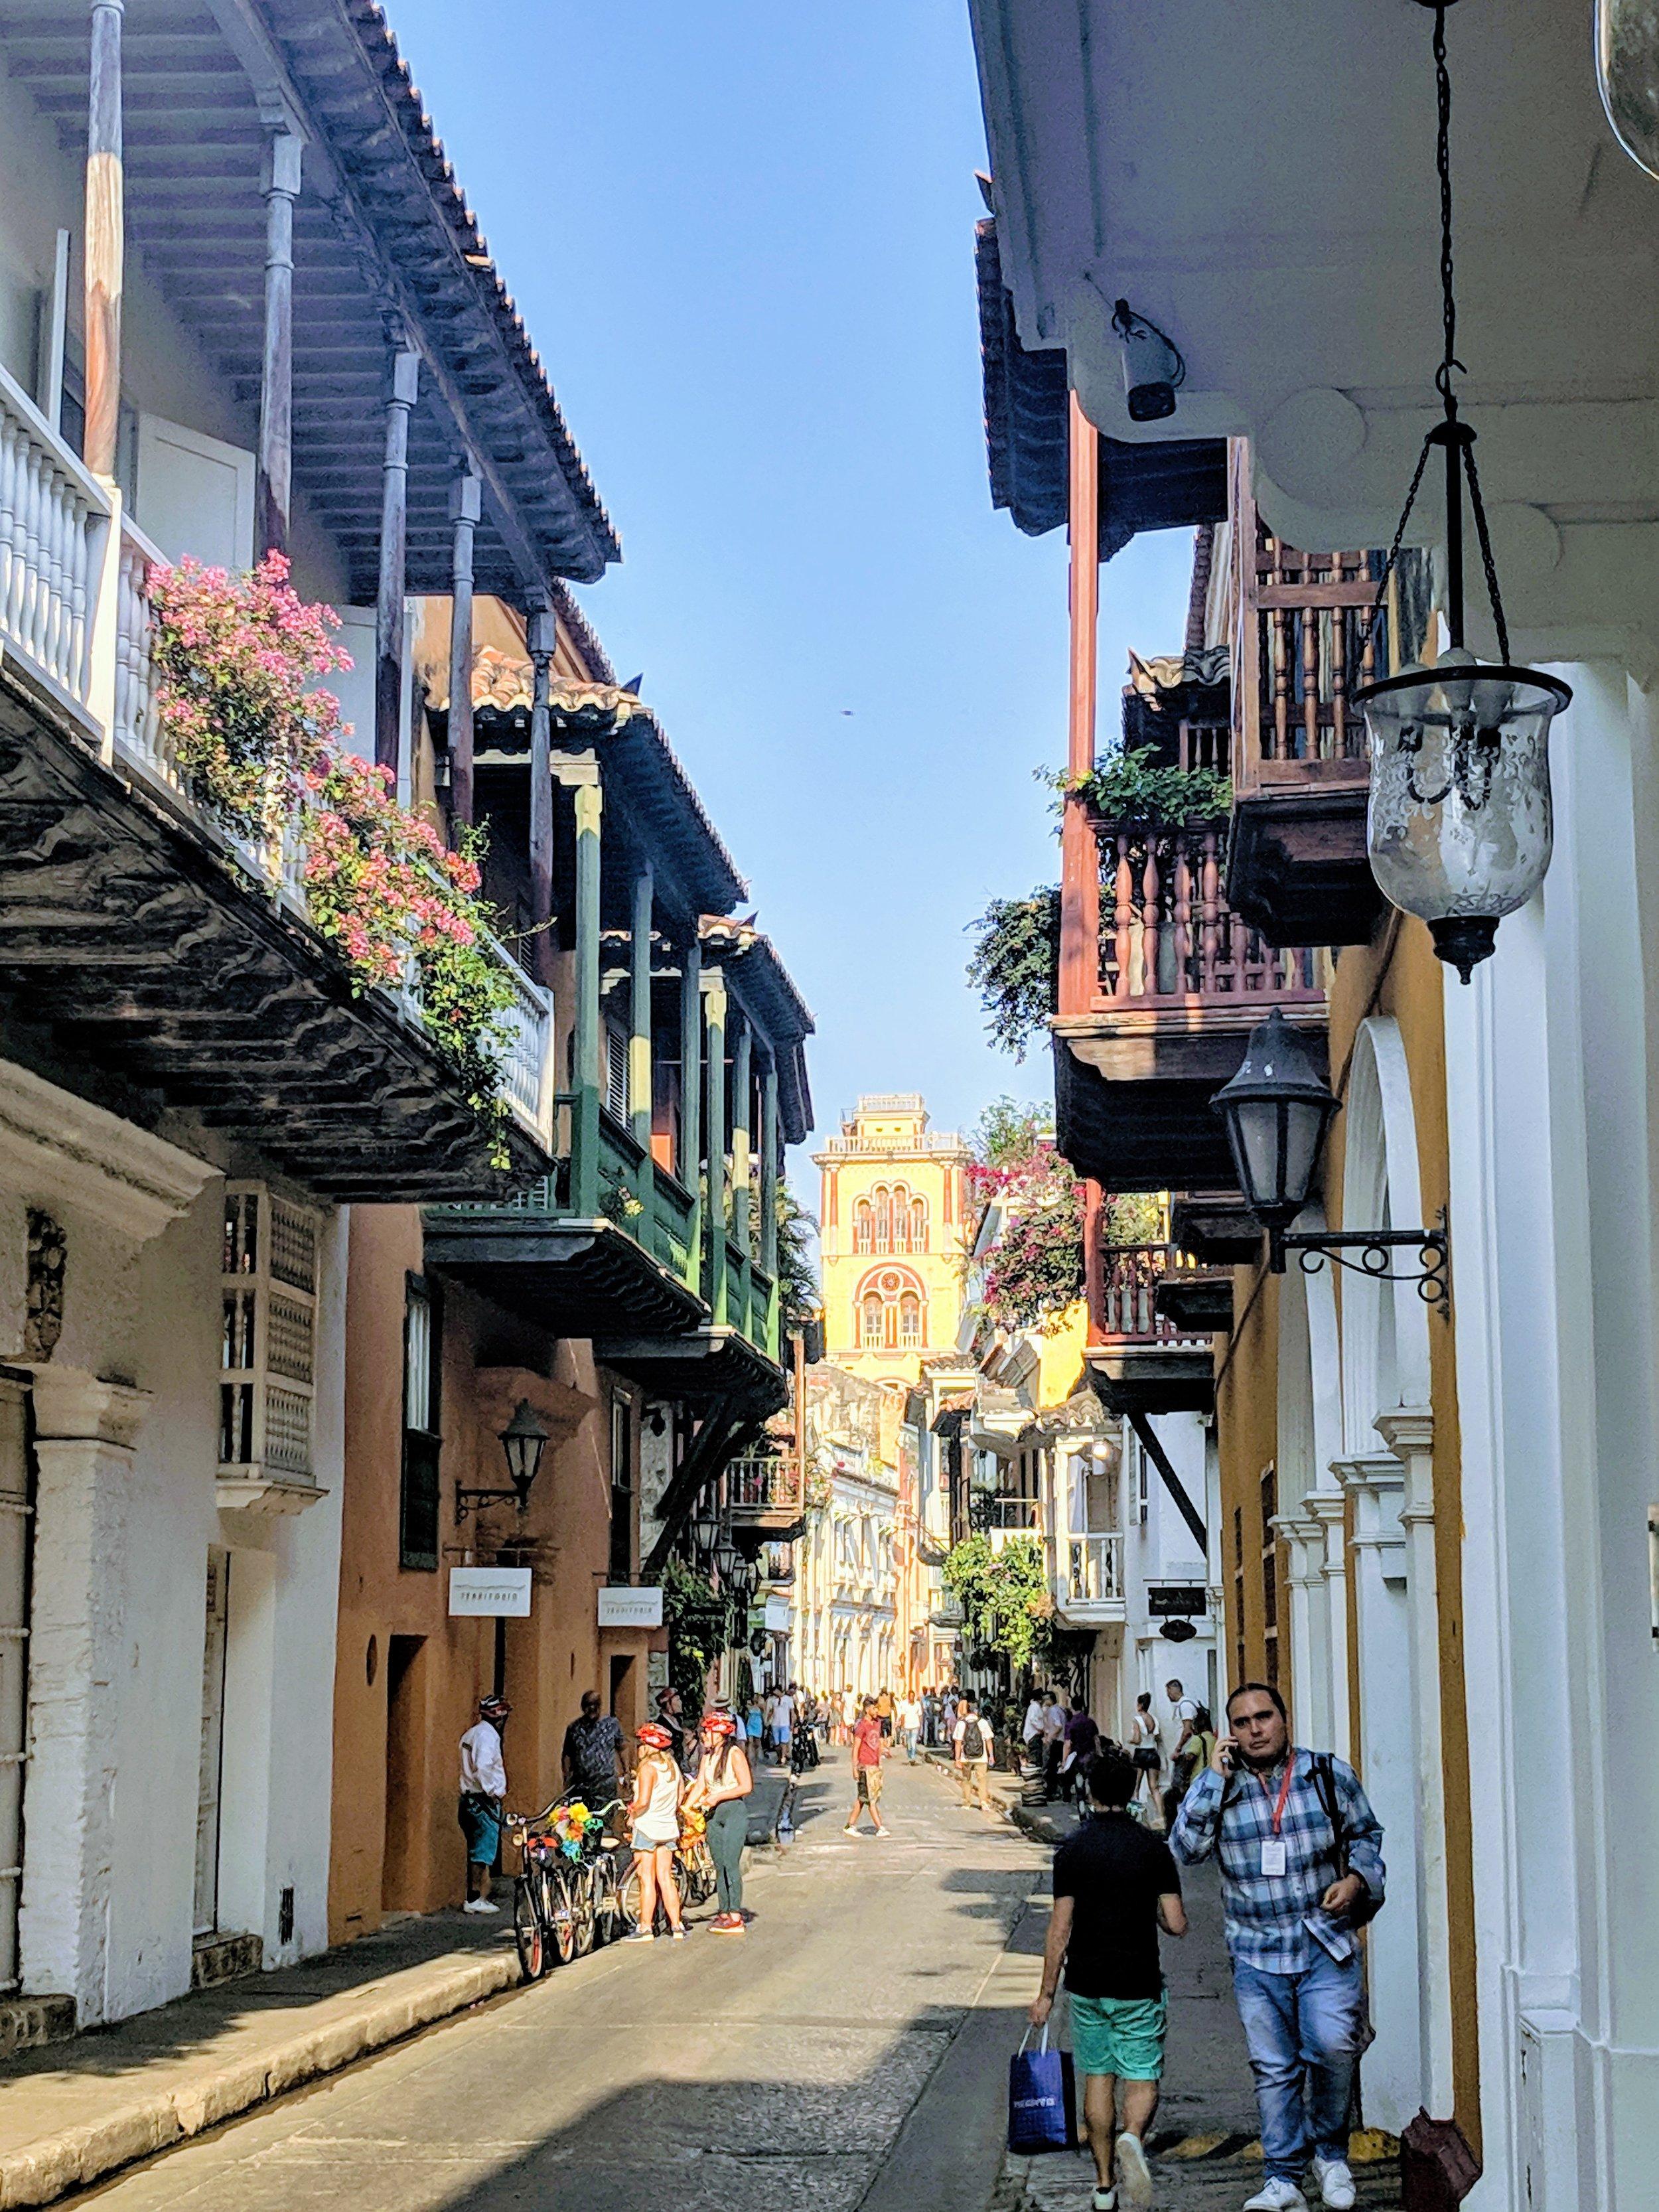 One of Cartagena's many beautiful streets